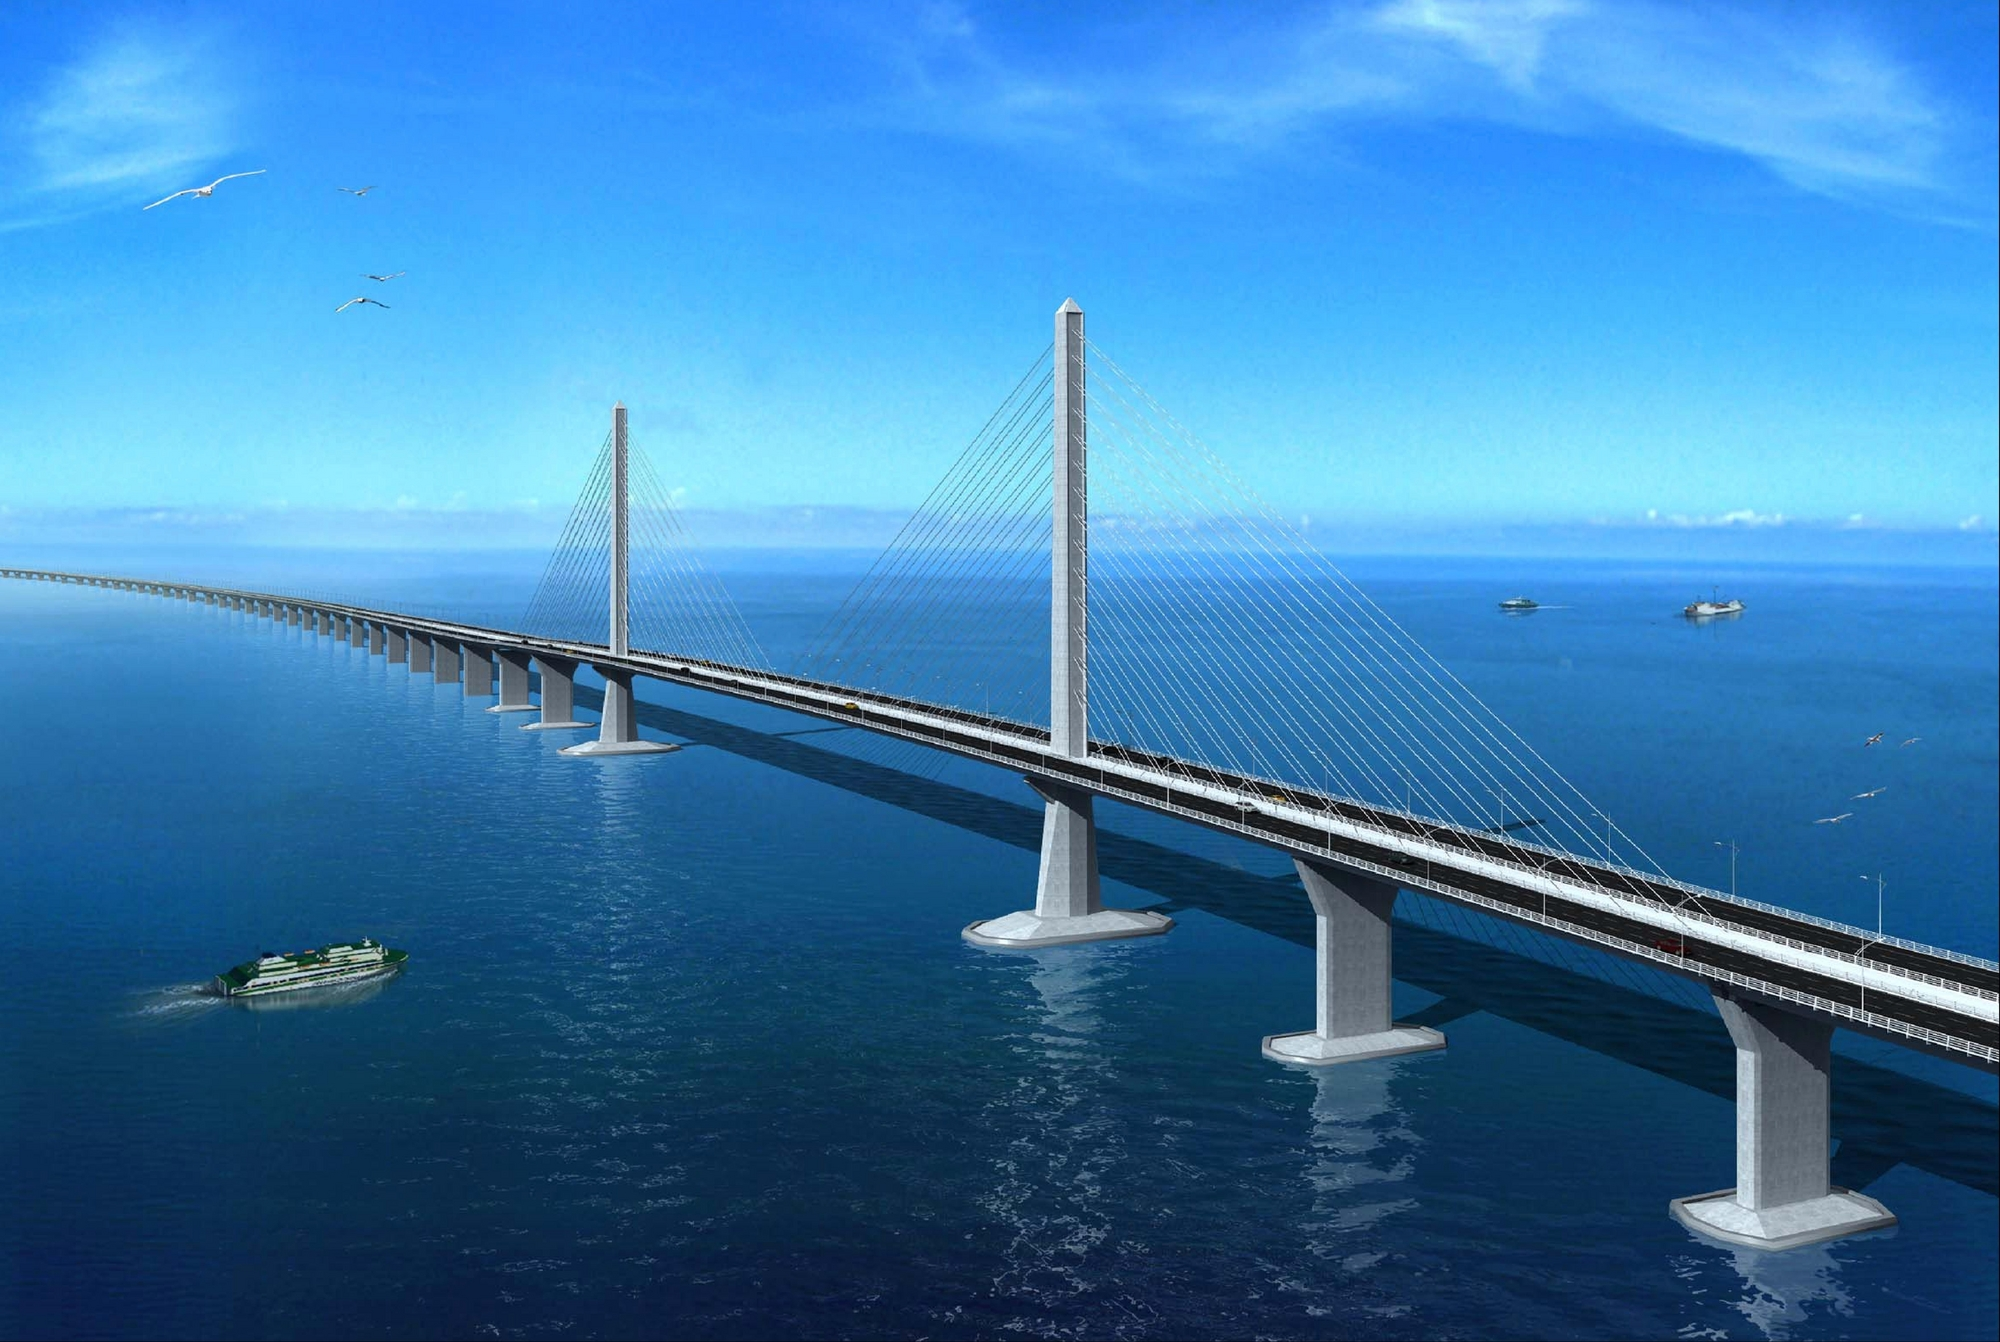 Ponte tra Hong Kong, Zhuhai e Macao